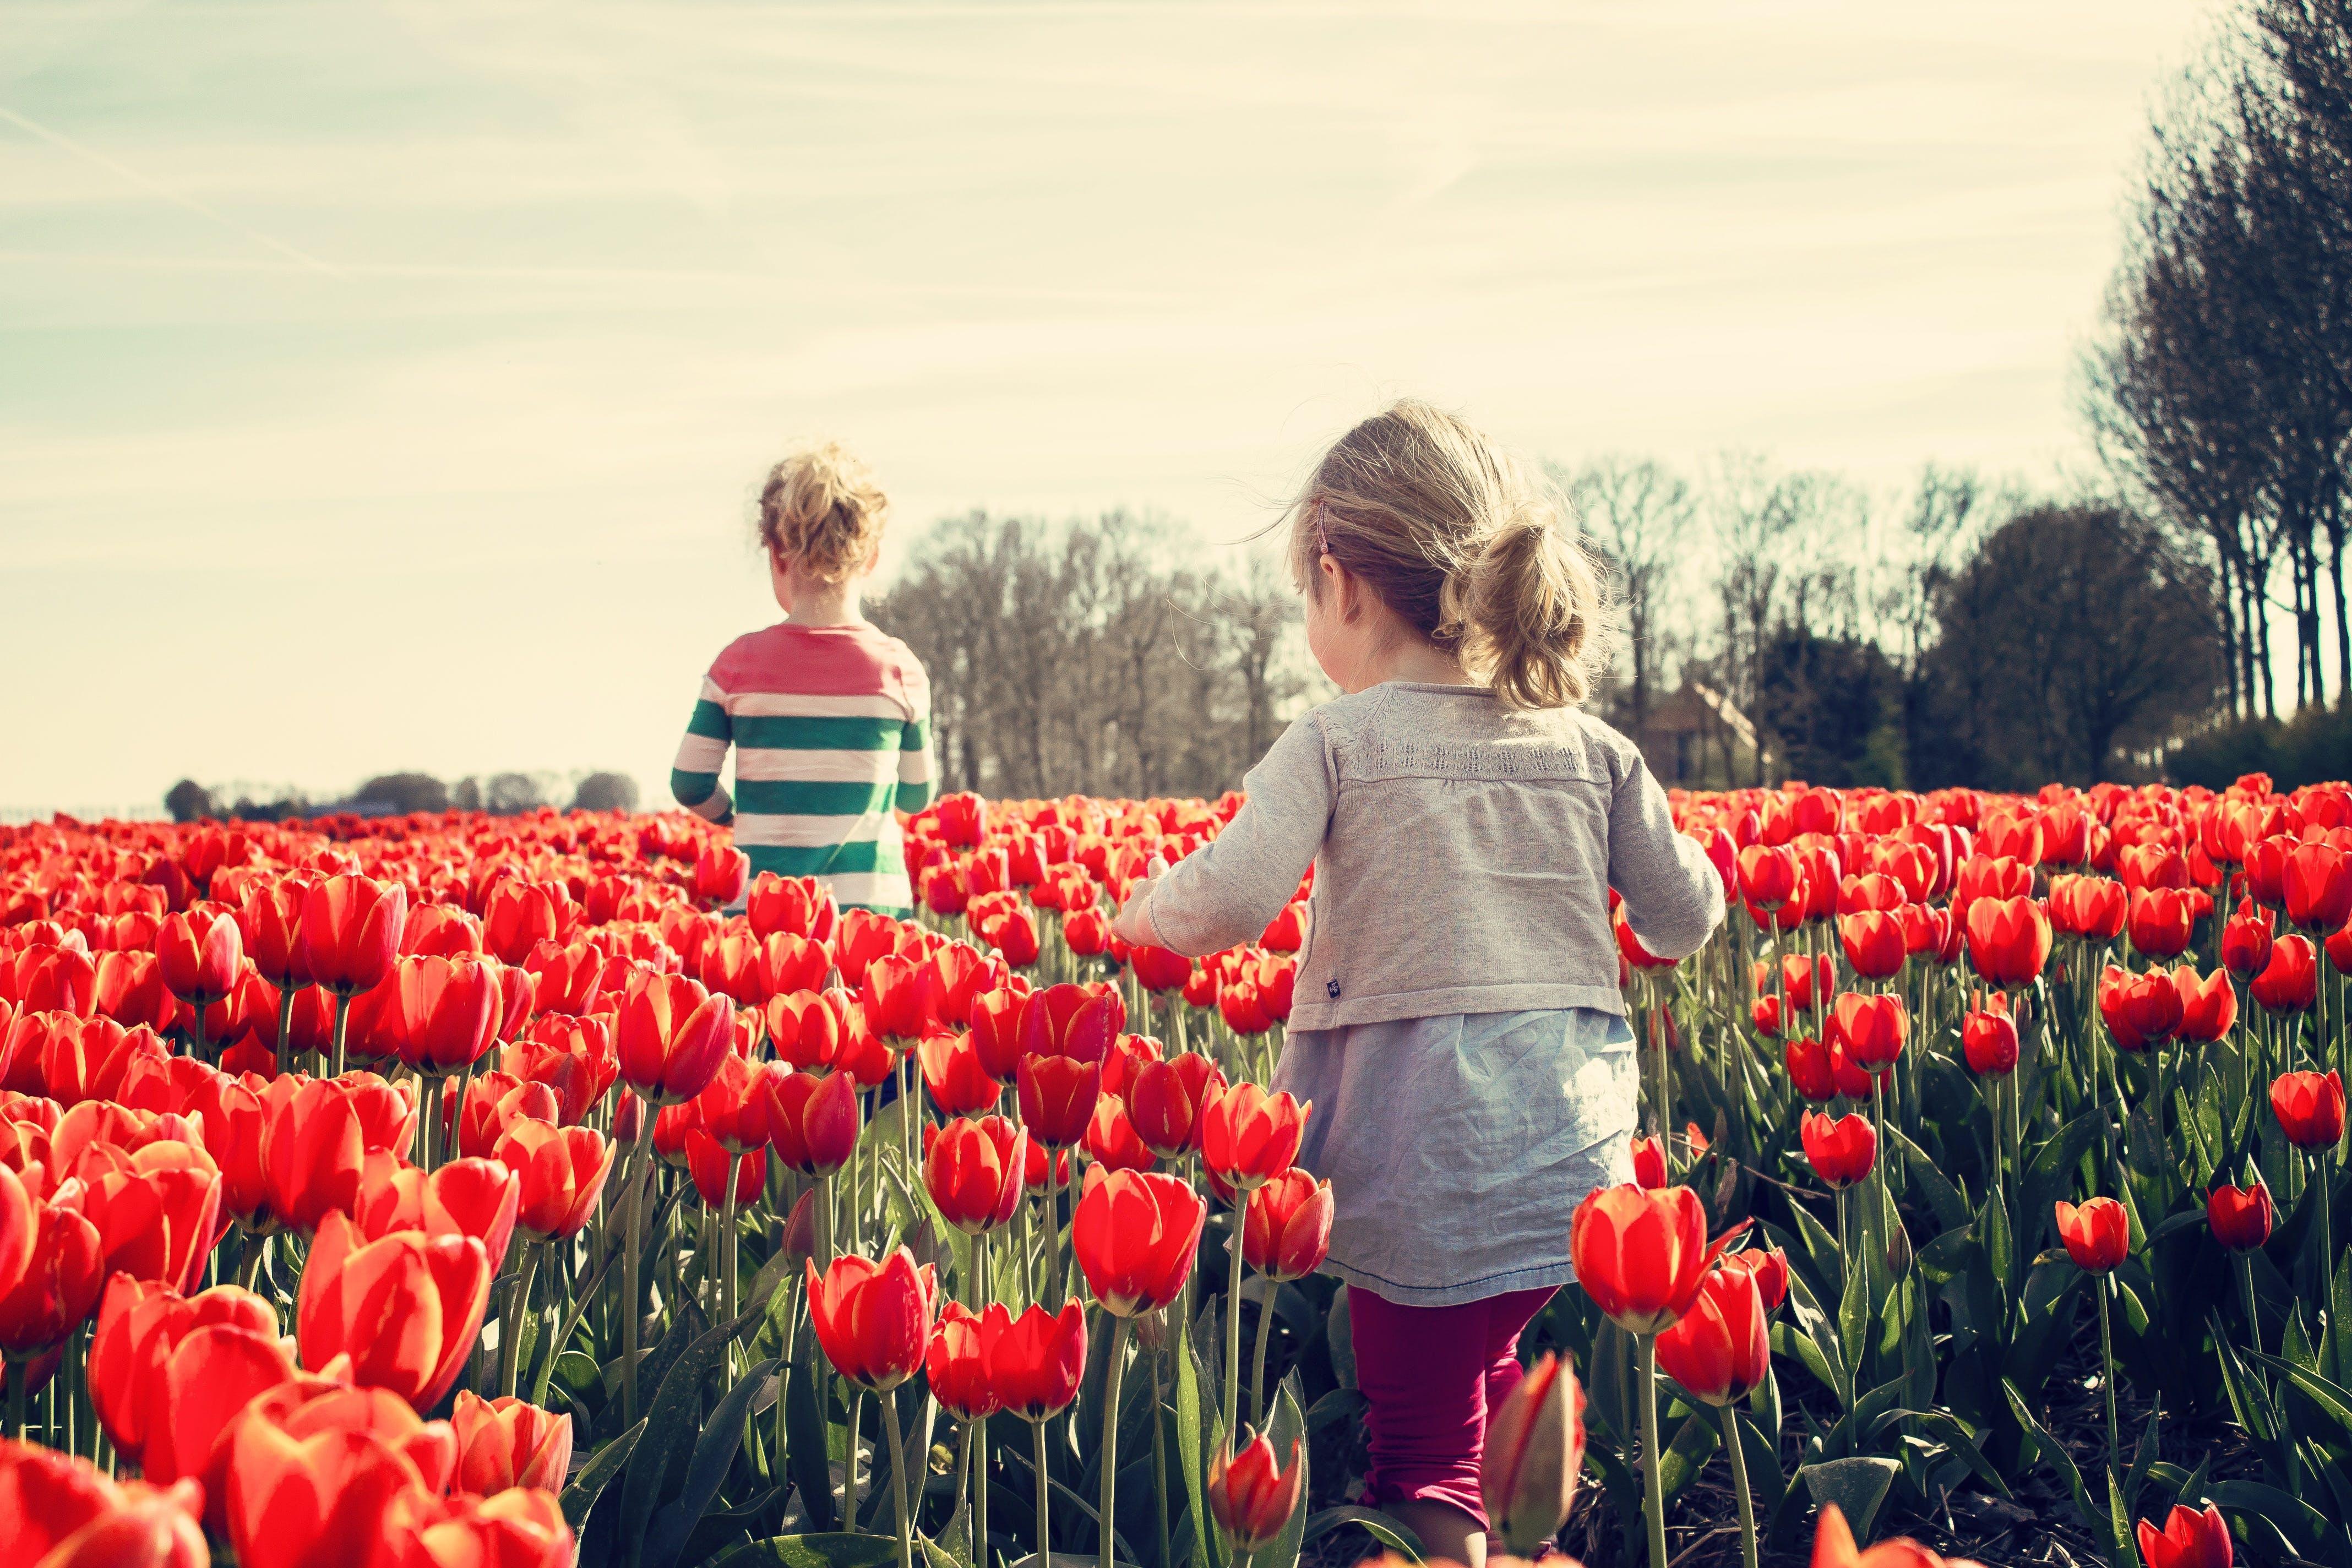 2 Kids Walking on Red Tulip Garden Under Blu Sky